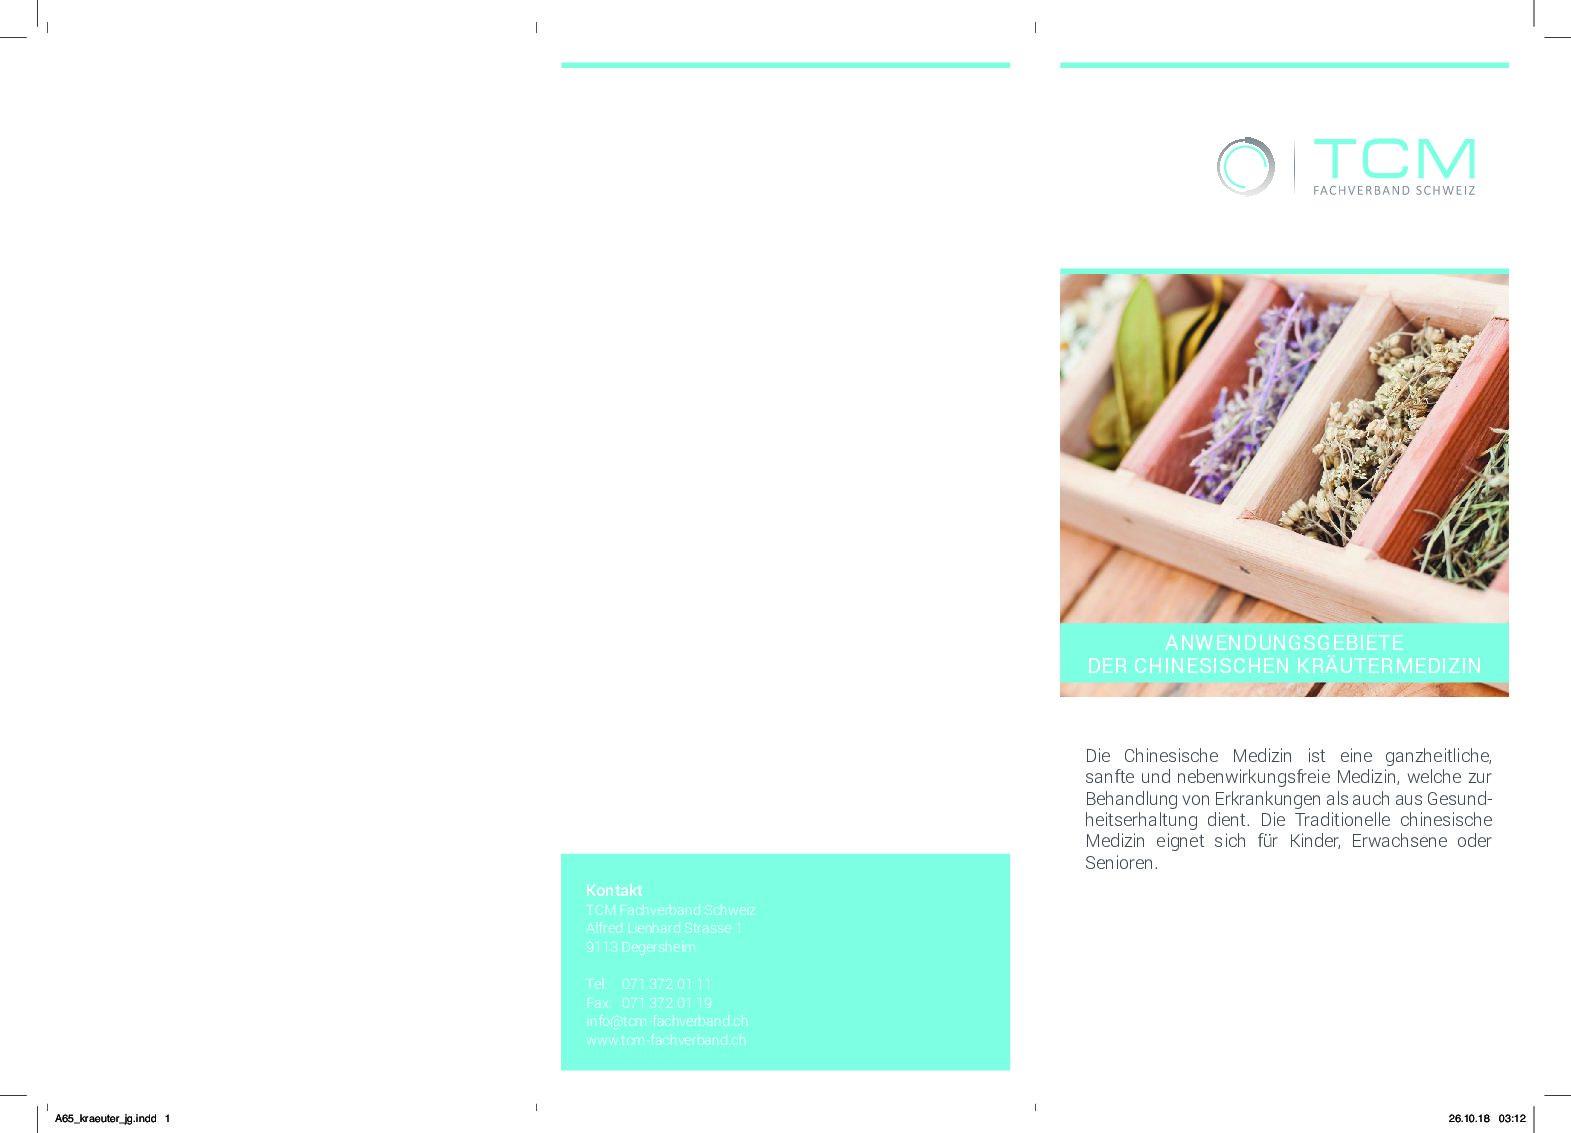 Merkblatt/Faltflyer: Anwendungsgebiete Der Chinesischen Kräutermedizin